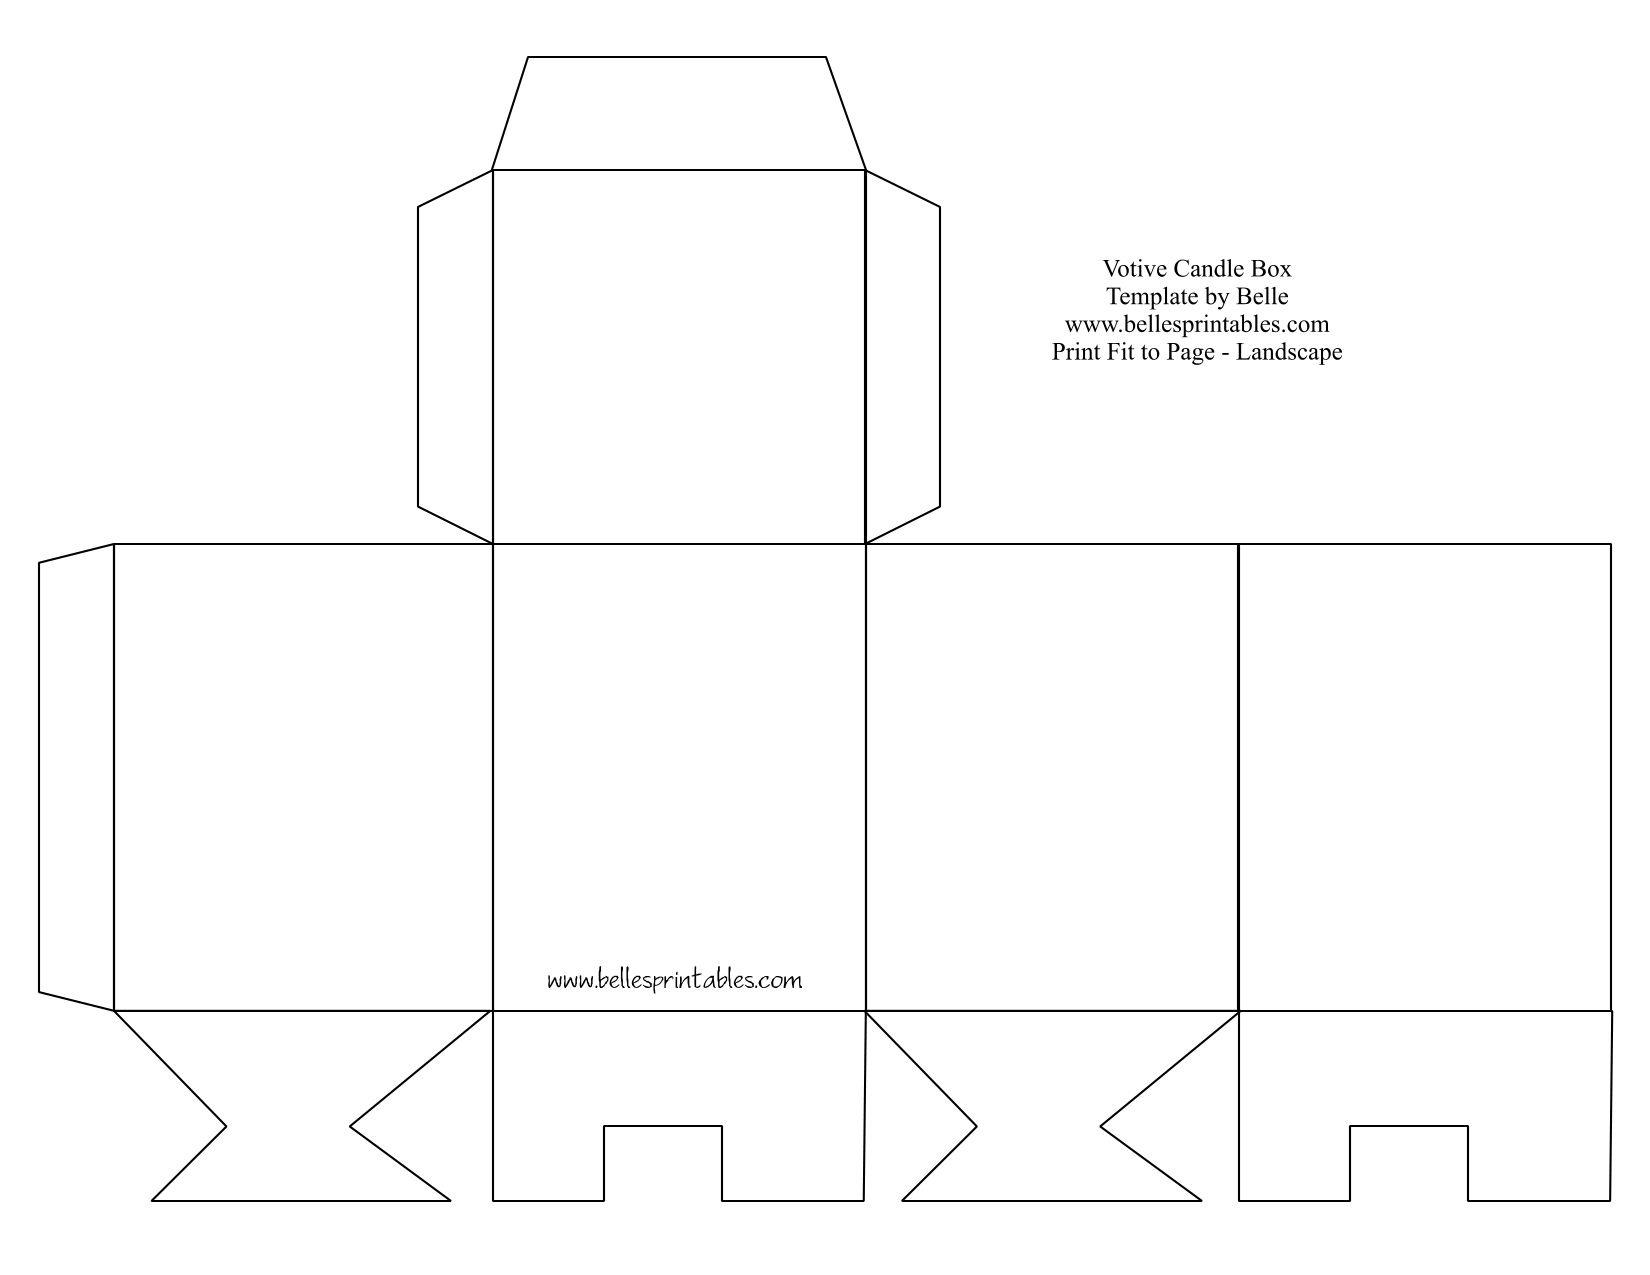 Printable Purse Template | Cute Paper Gift Box With Free Printable - Gift Box Templates Free Printable